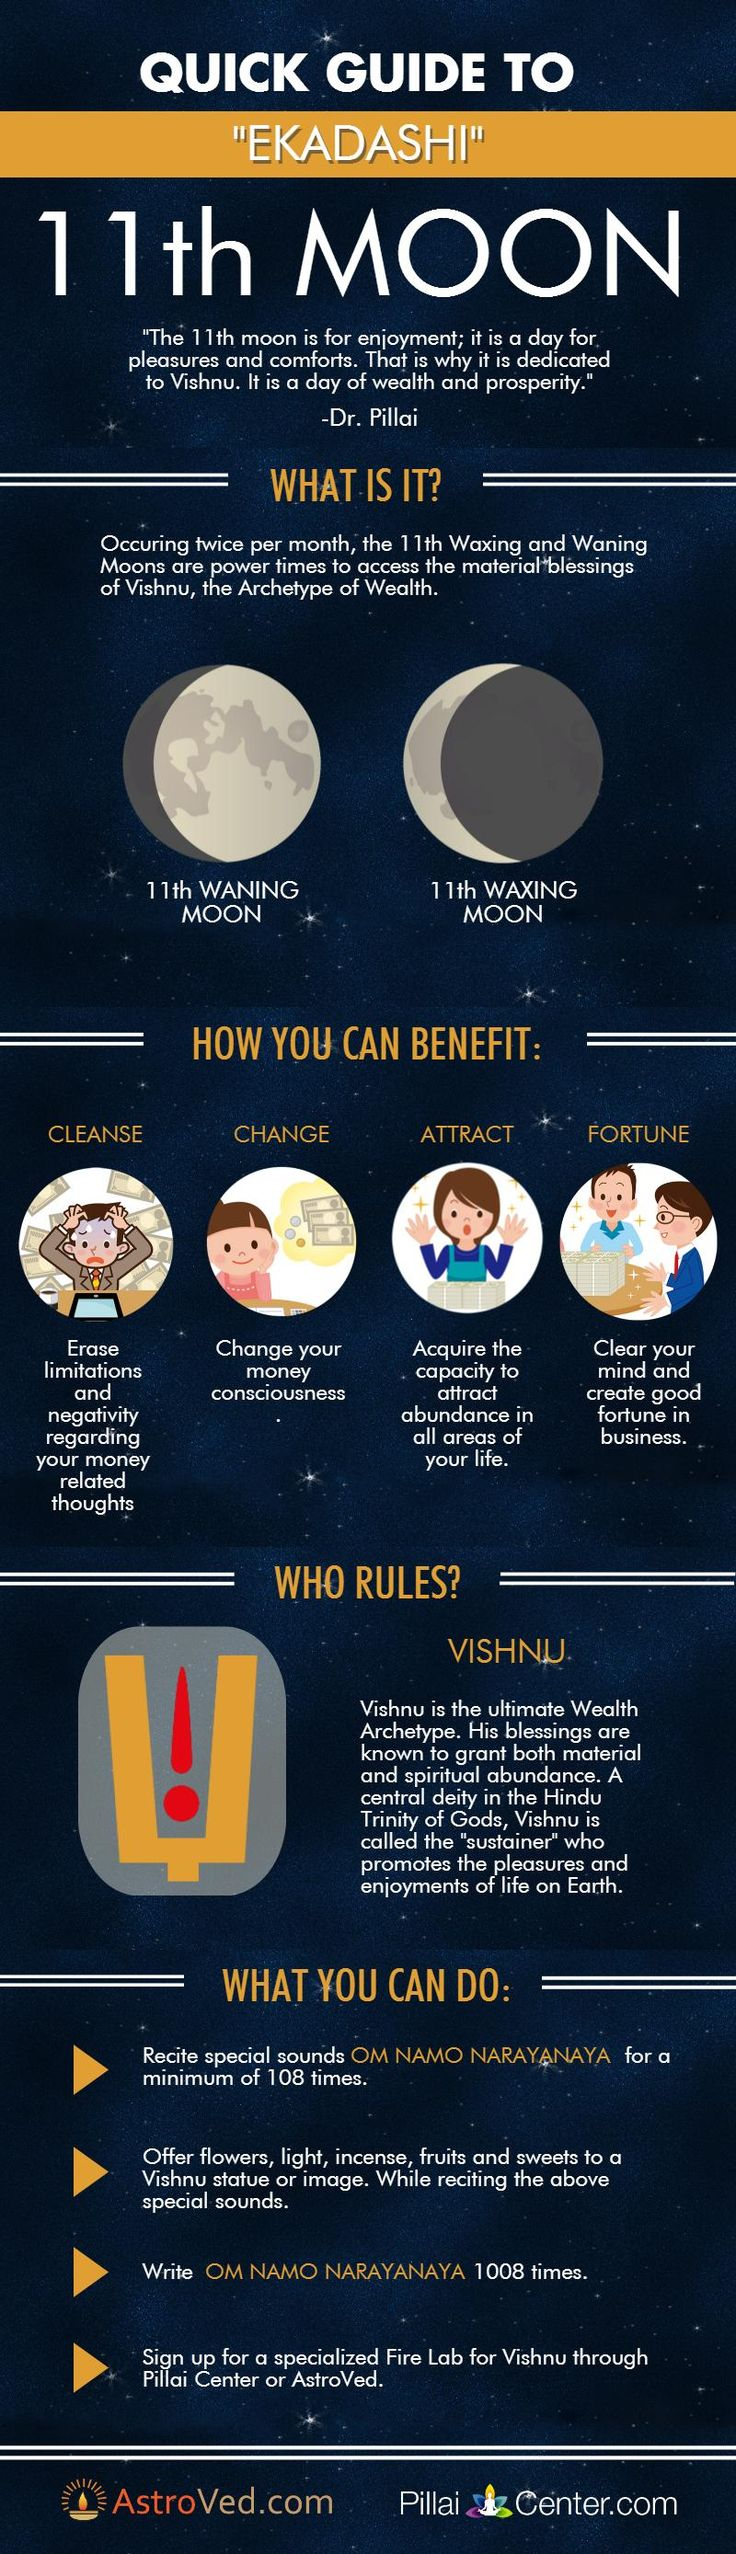 11th Moon - Vedic Astrology